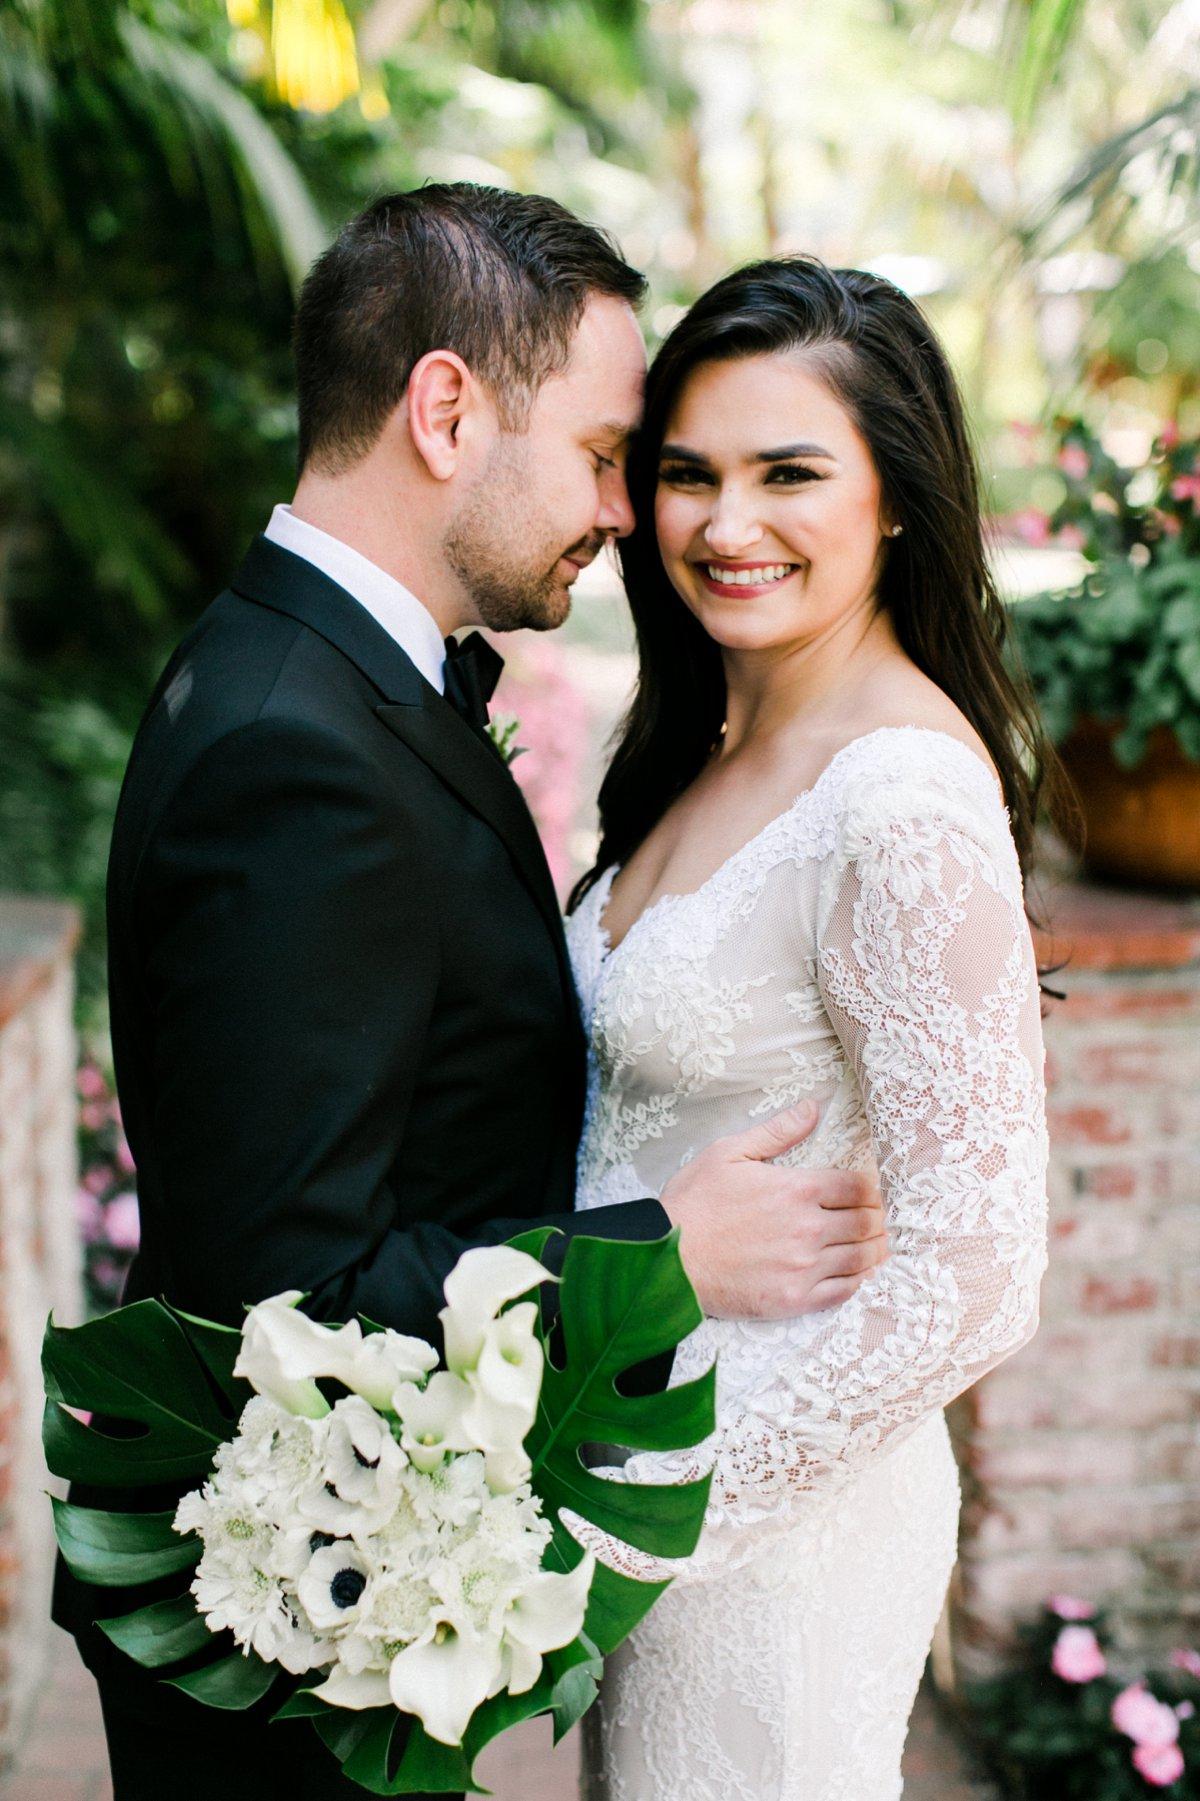 Wedding Dresses Santa Barbara 9 Marvelous lace sleeve wedding dresses